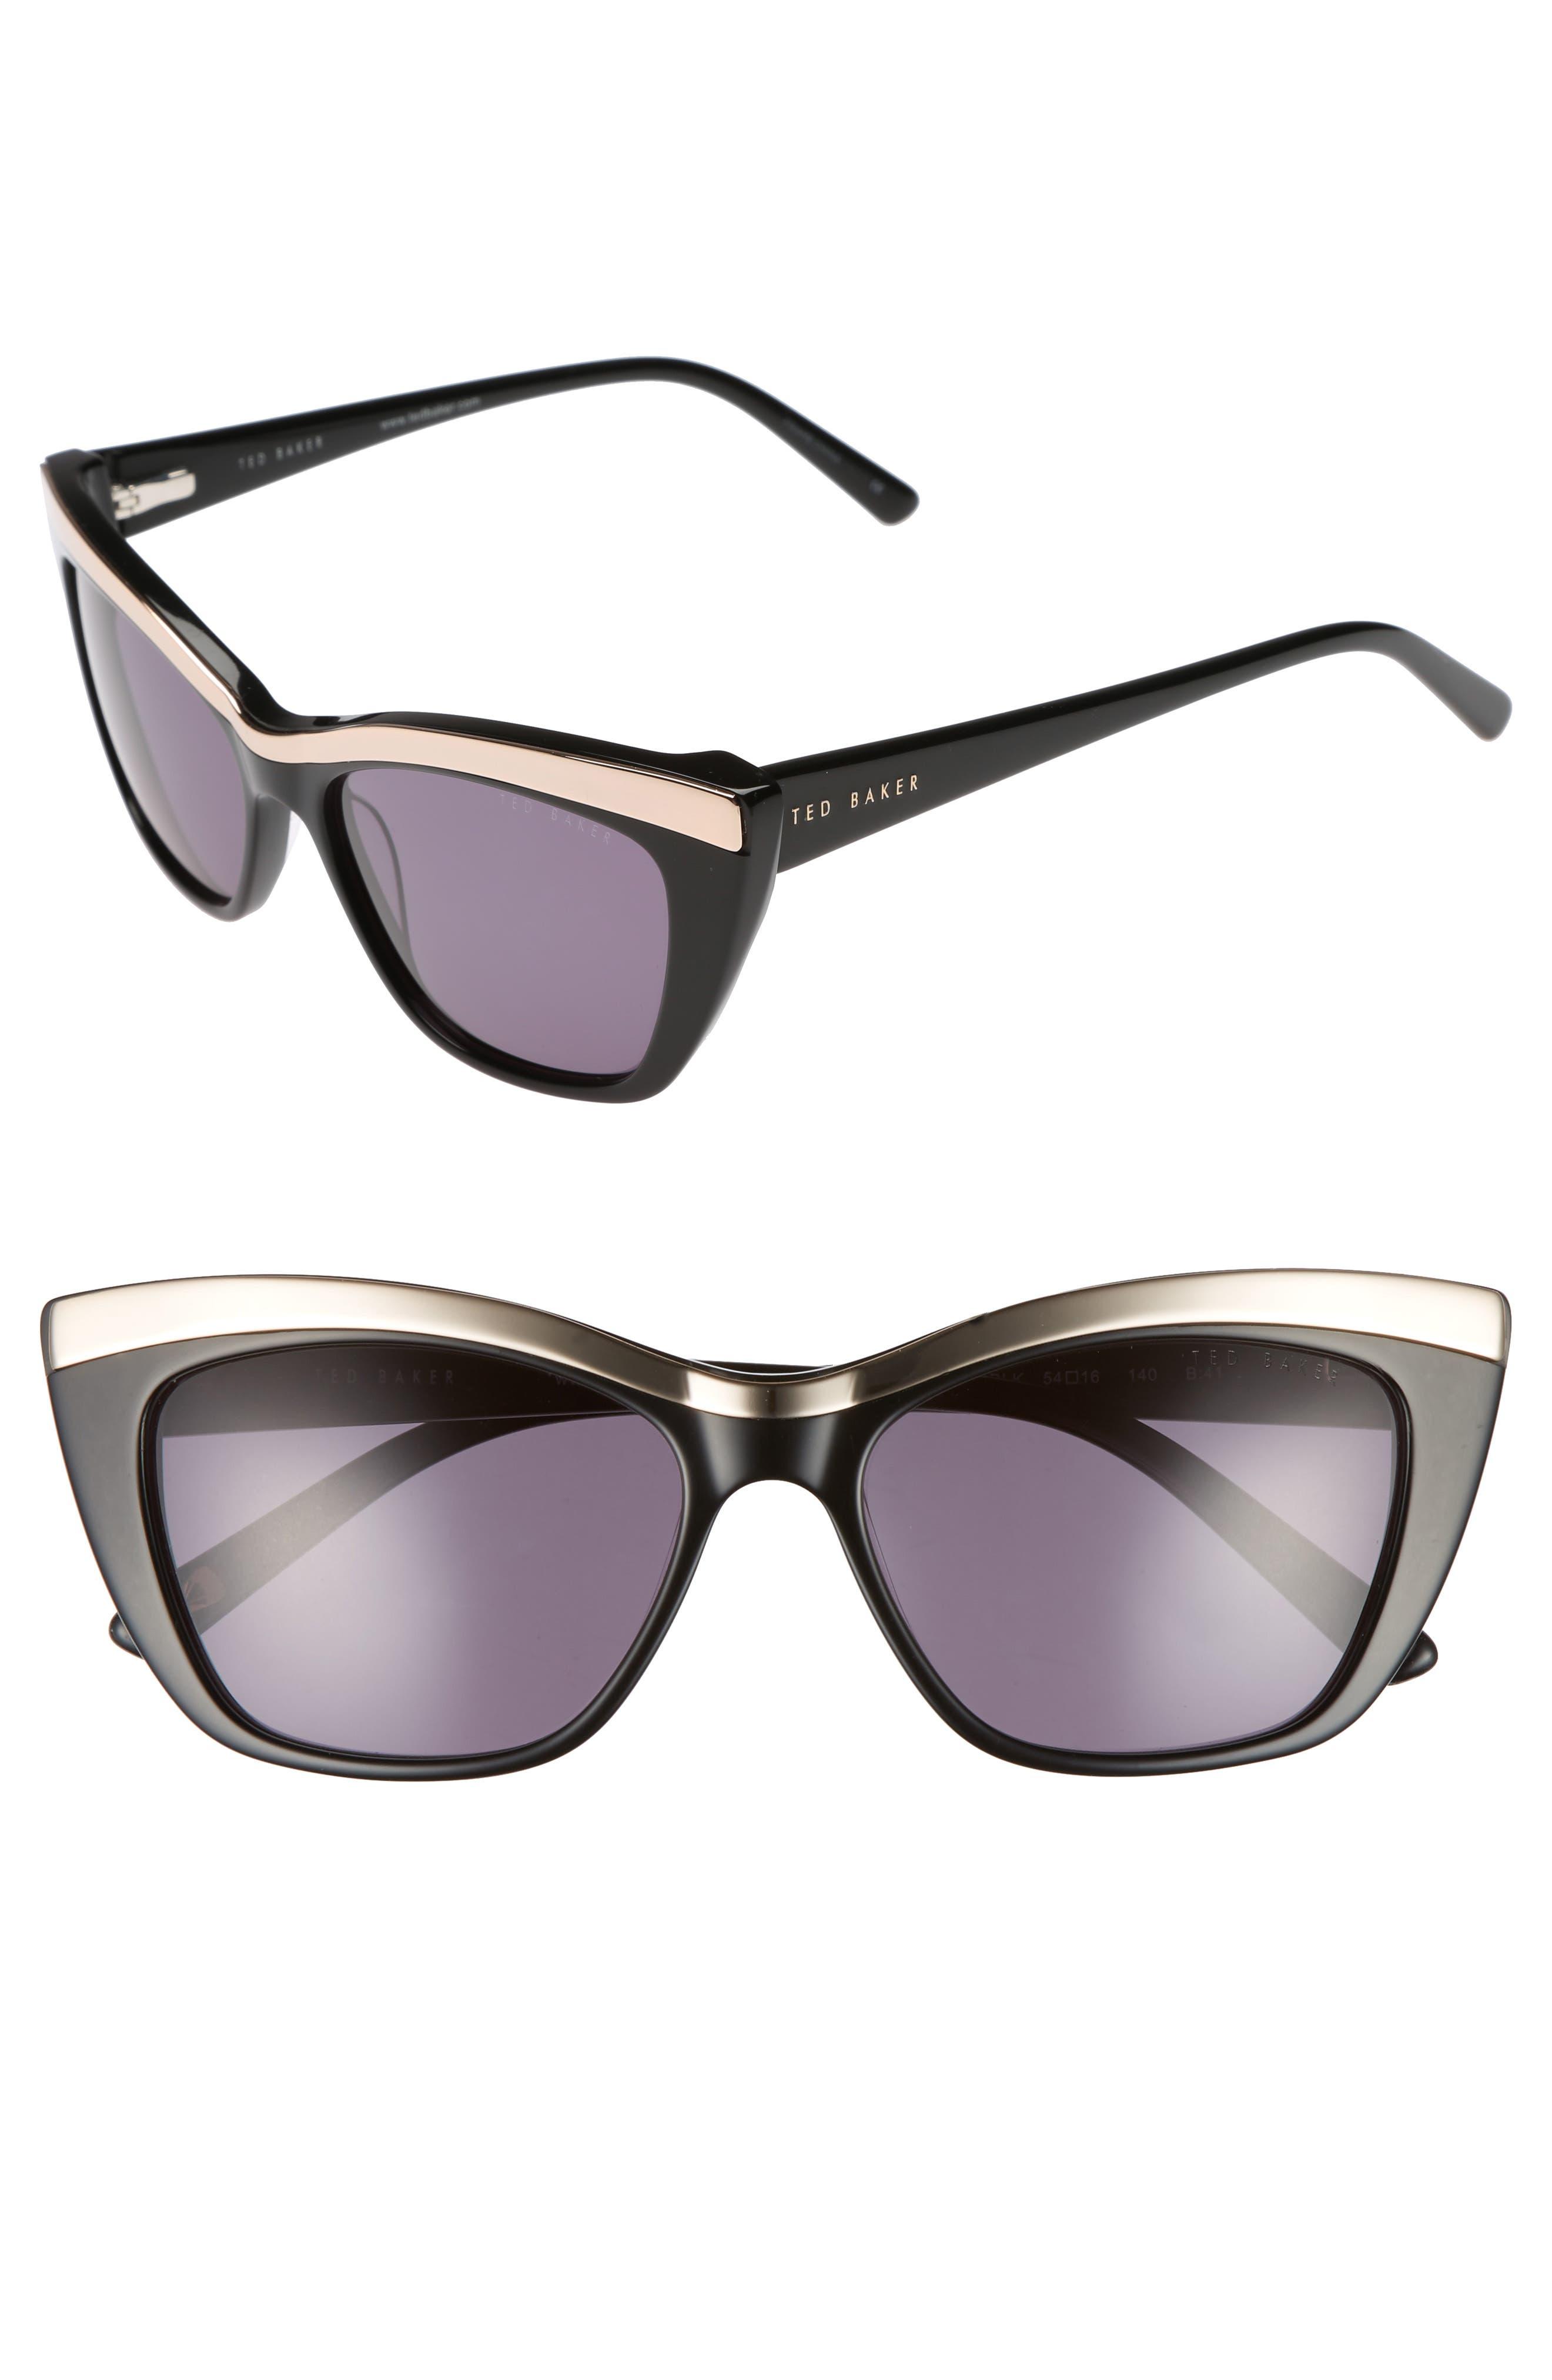 24abe9fa9586ab Ted Baker 54Mm Rectangle Cat Eye Sunglasses - Black